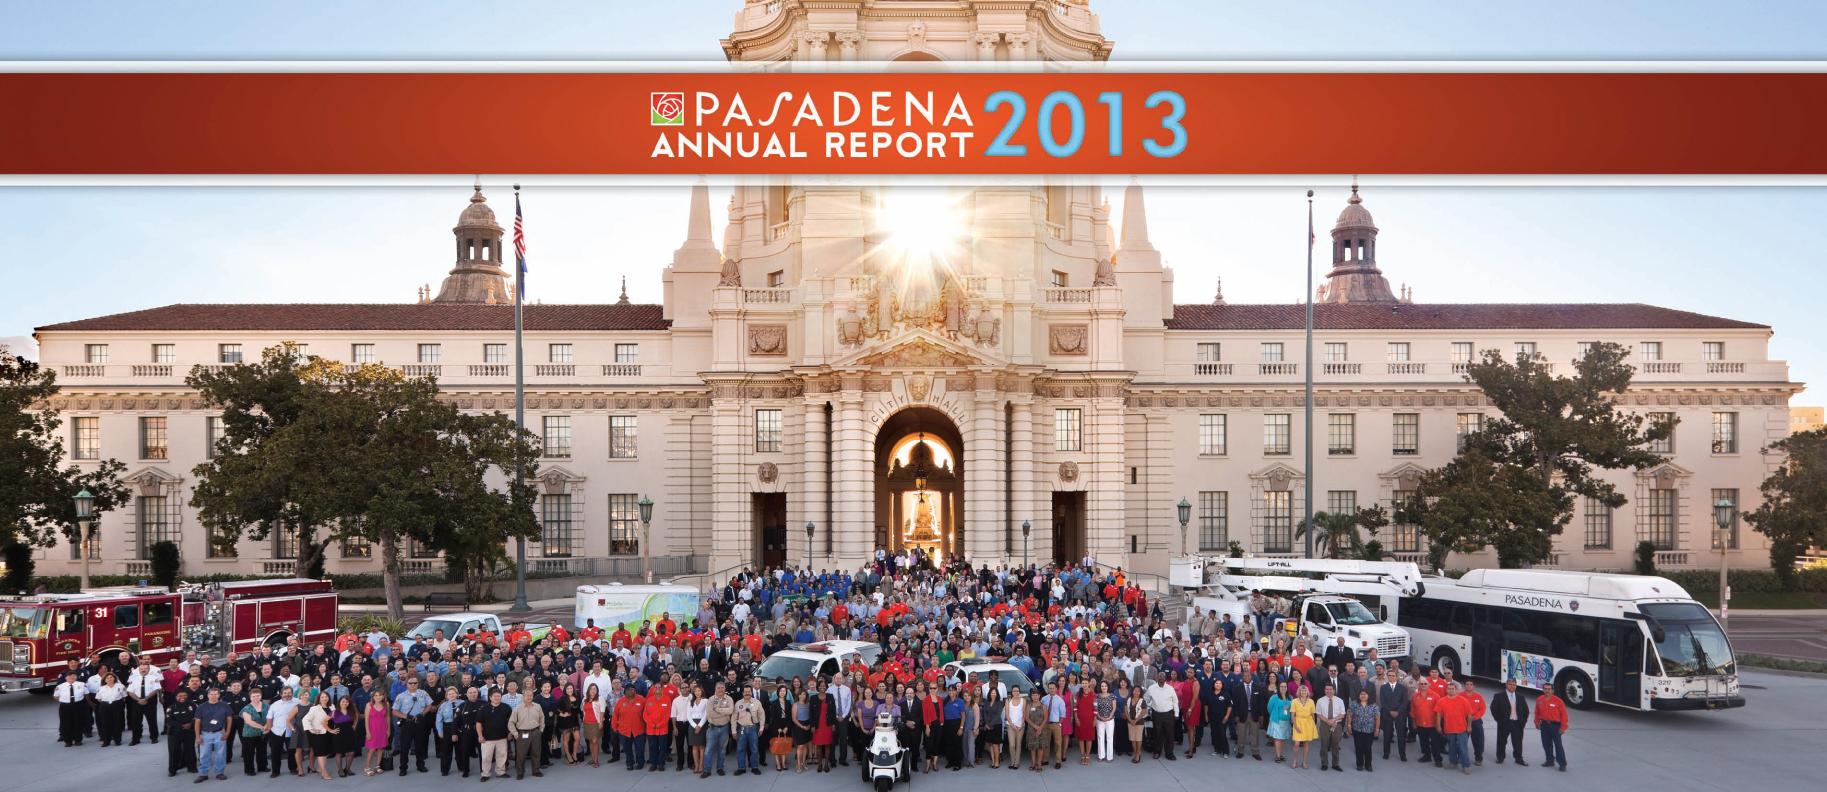 City of Pasadena 2013 Annual Report graphic